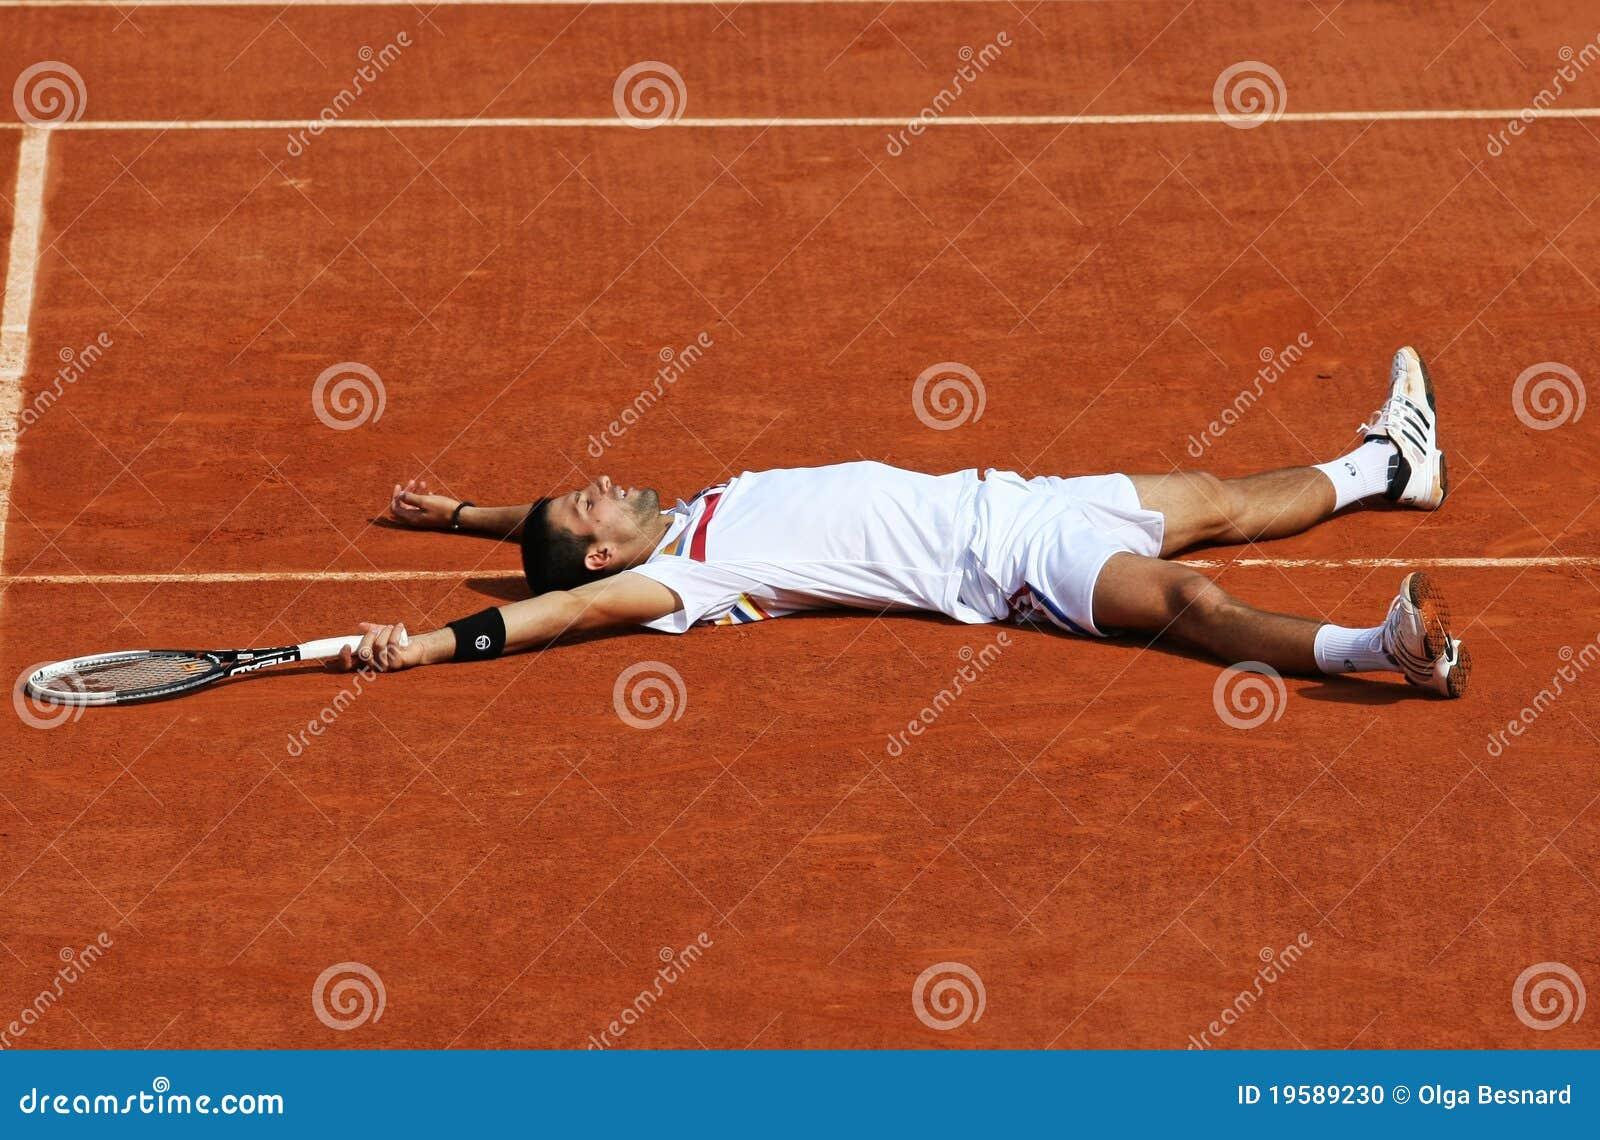 Roland Garros Handdoek.Novak Djokovic Srb In Roland Garros 2011 Redactionele Afbeelding